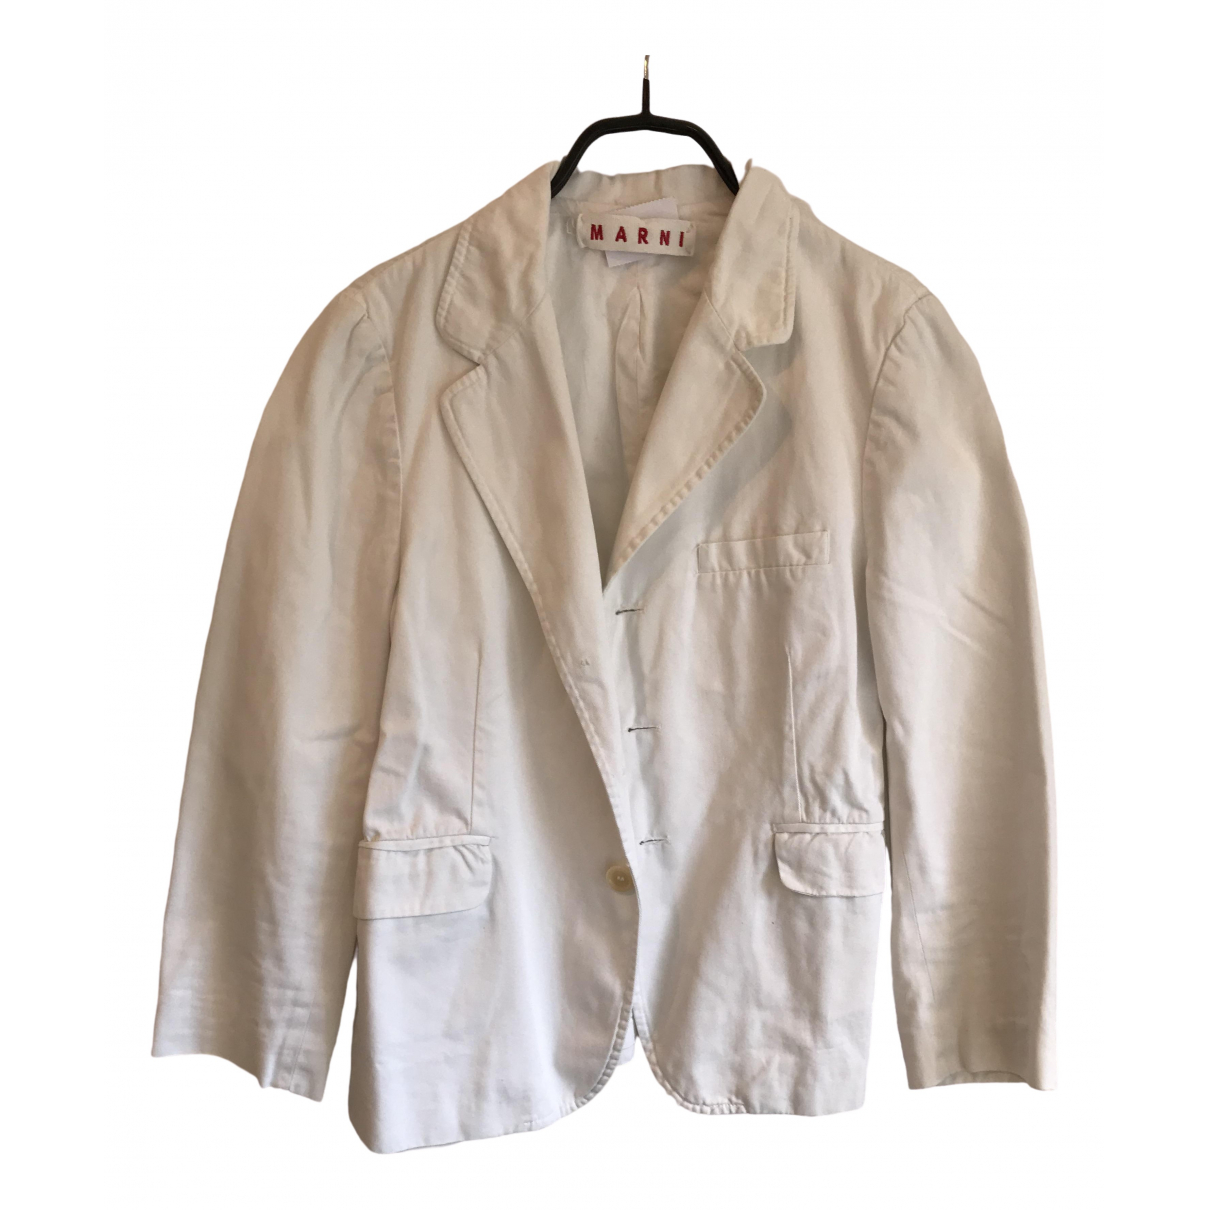 Marni \N White Denim - Jeans jacket for Women 42 IT